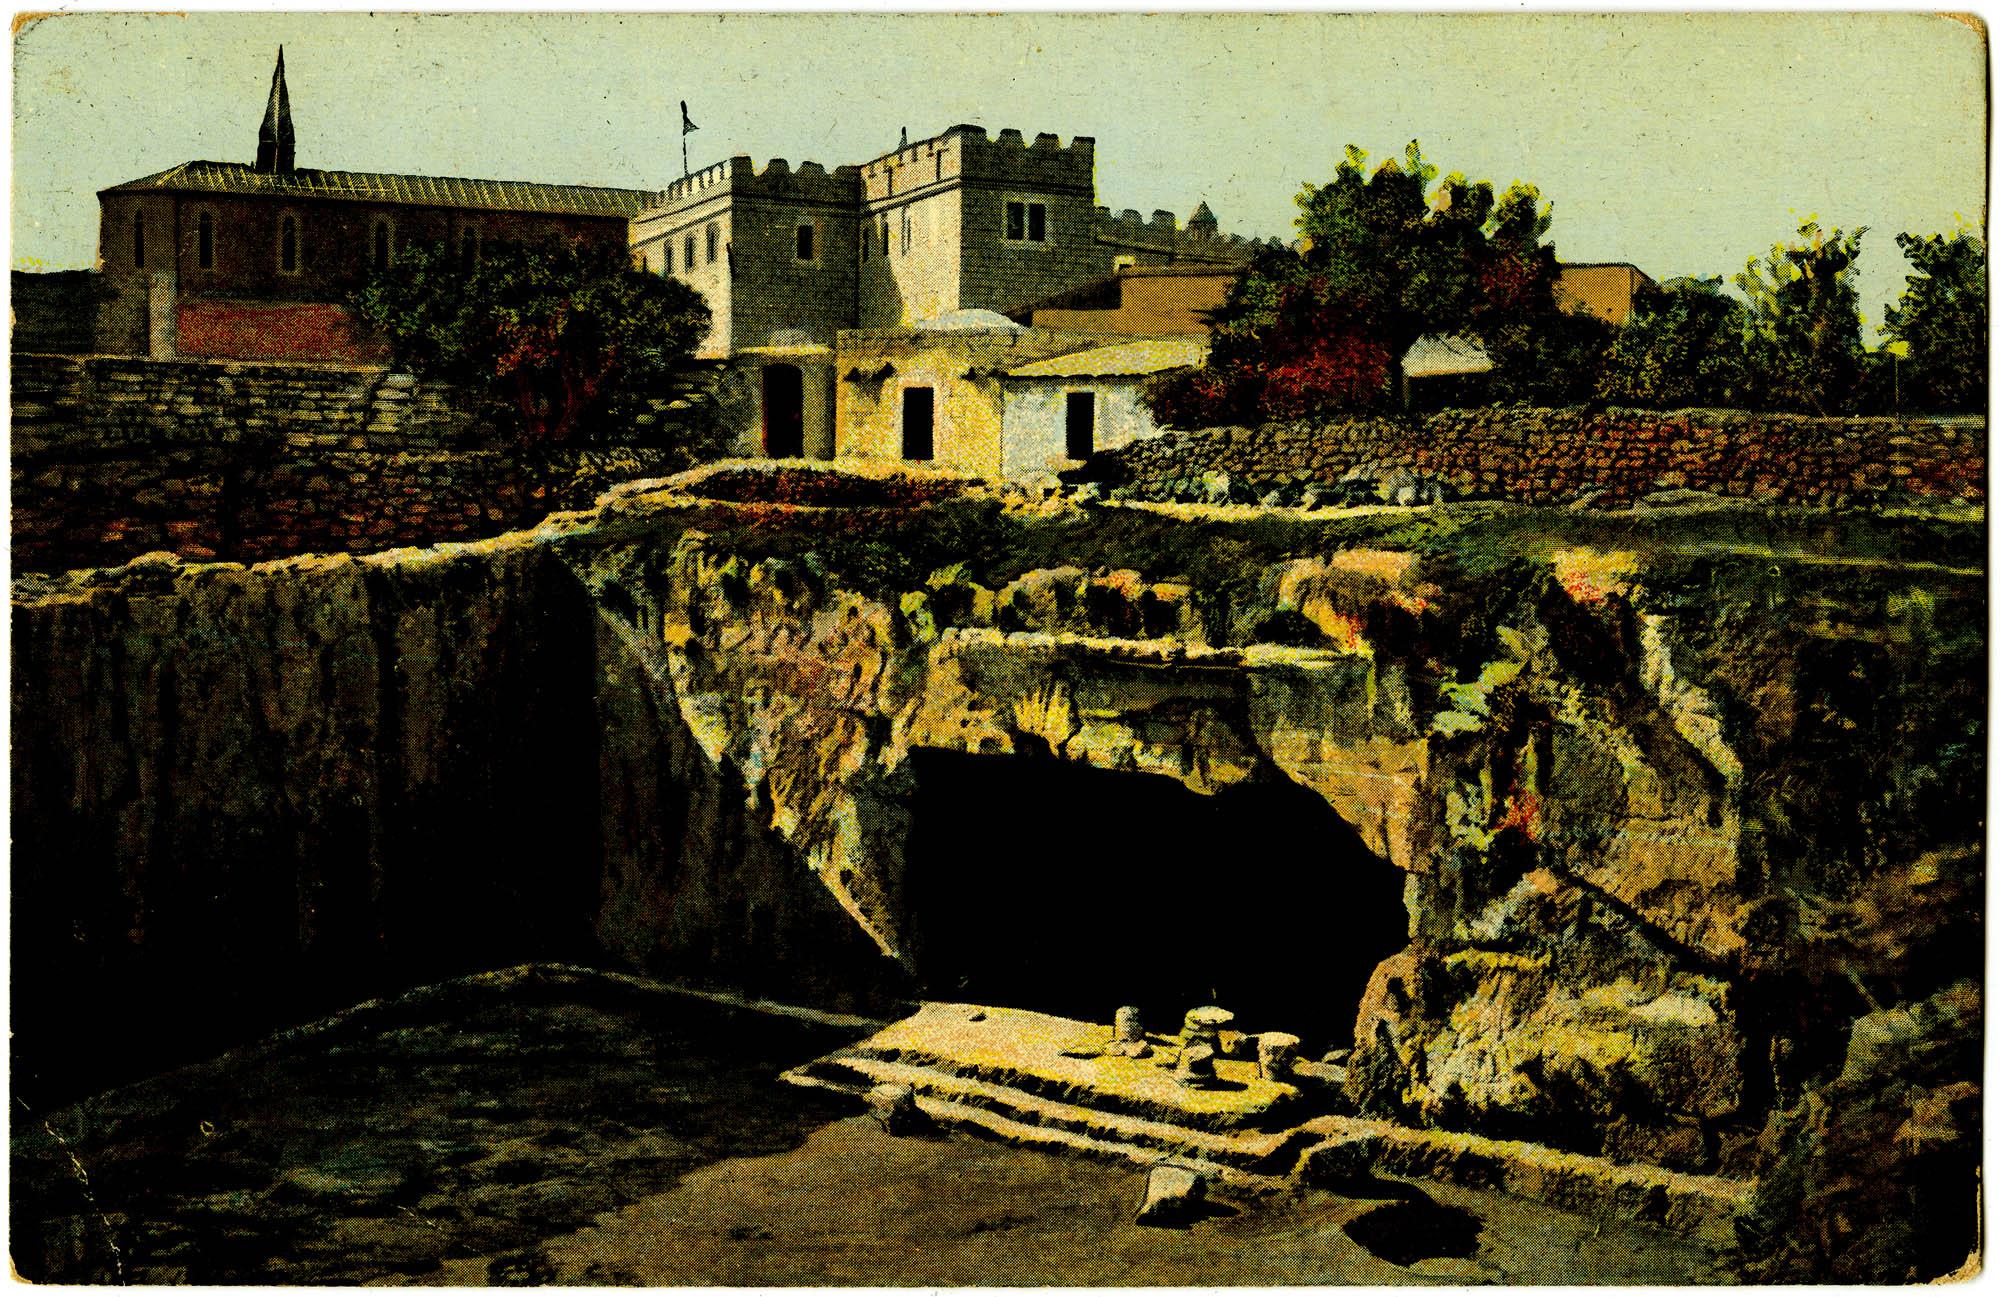 Jerusalem. Les tombeaux des rois. / Tombs of the Kings. / Königsgräber.